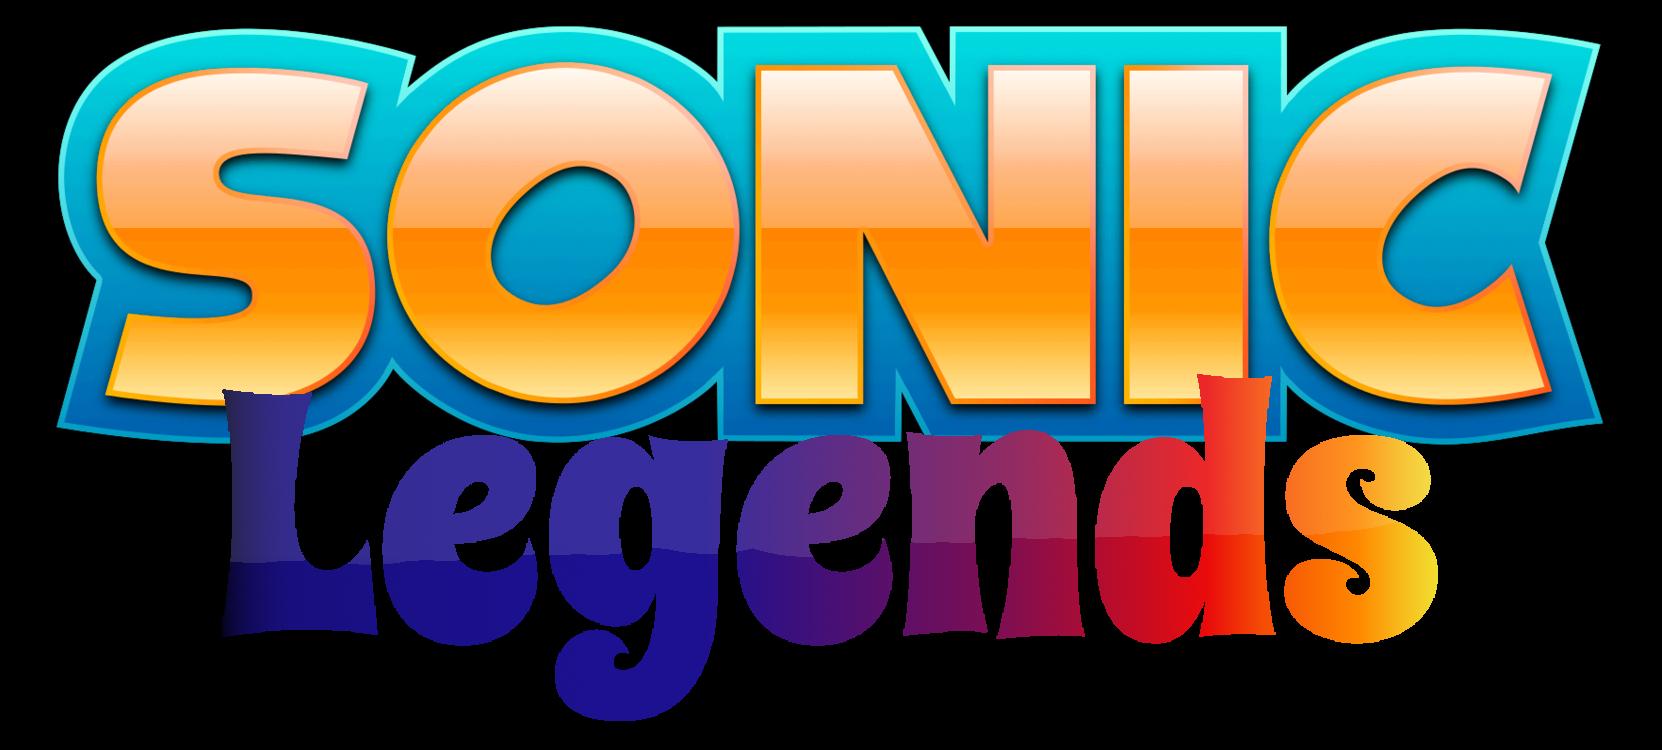 Sonic Legends (2016)